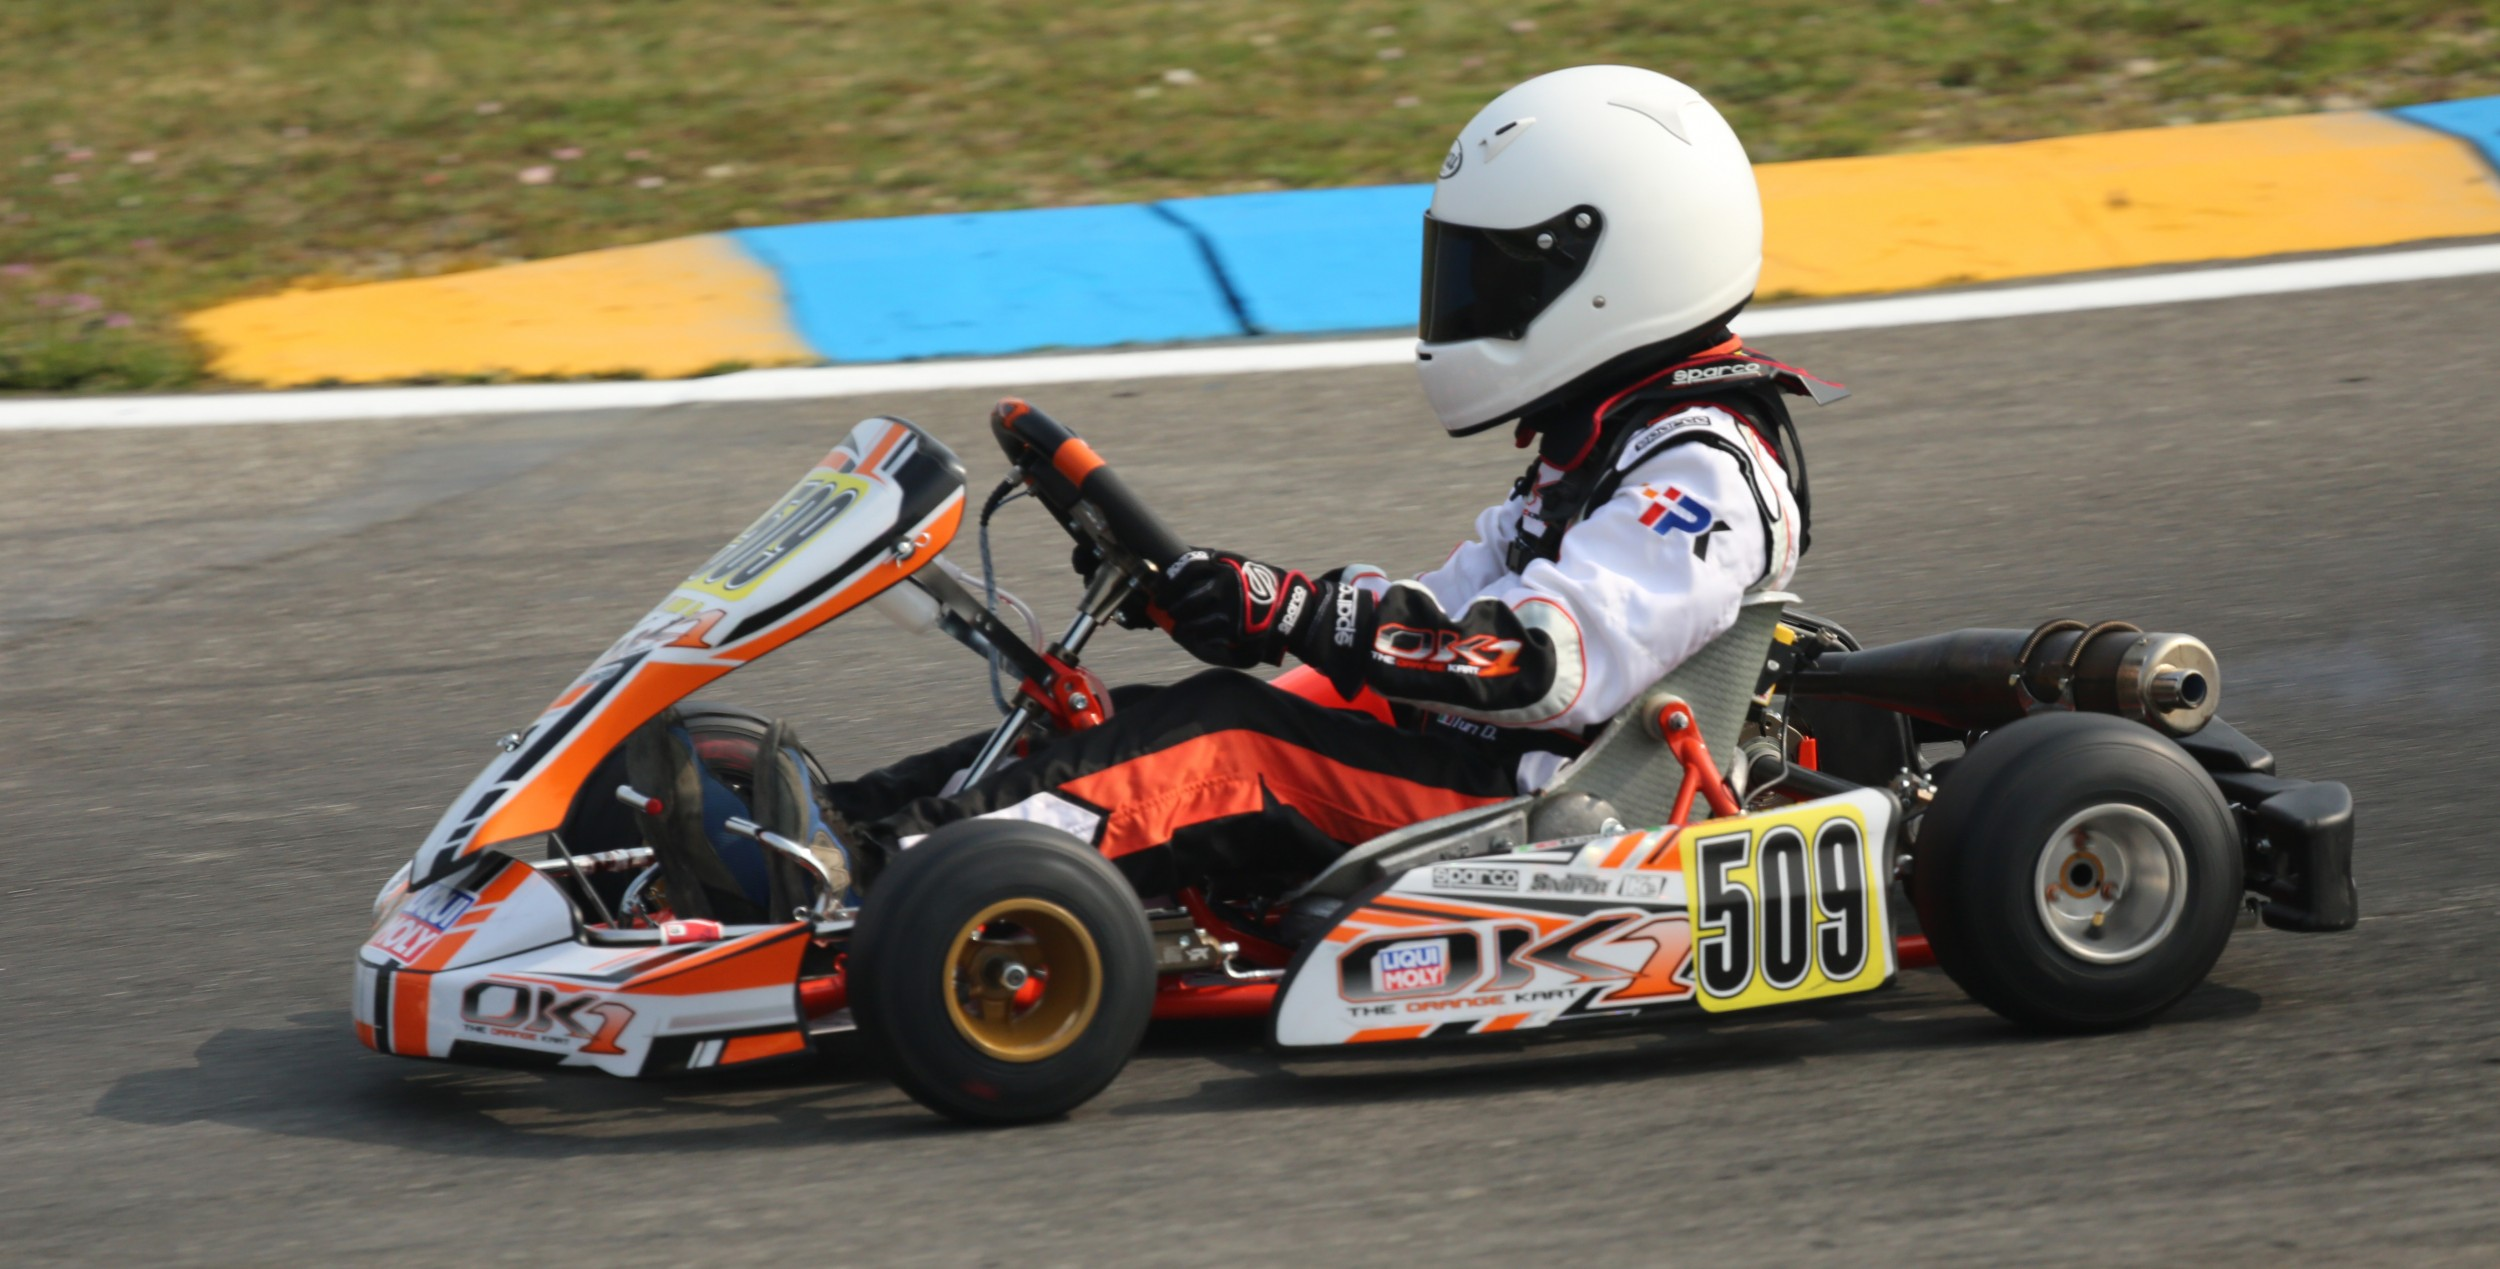 Ok1 Racing Team | Fg Racing vendita e assistenza per go-kart kart a ...